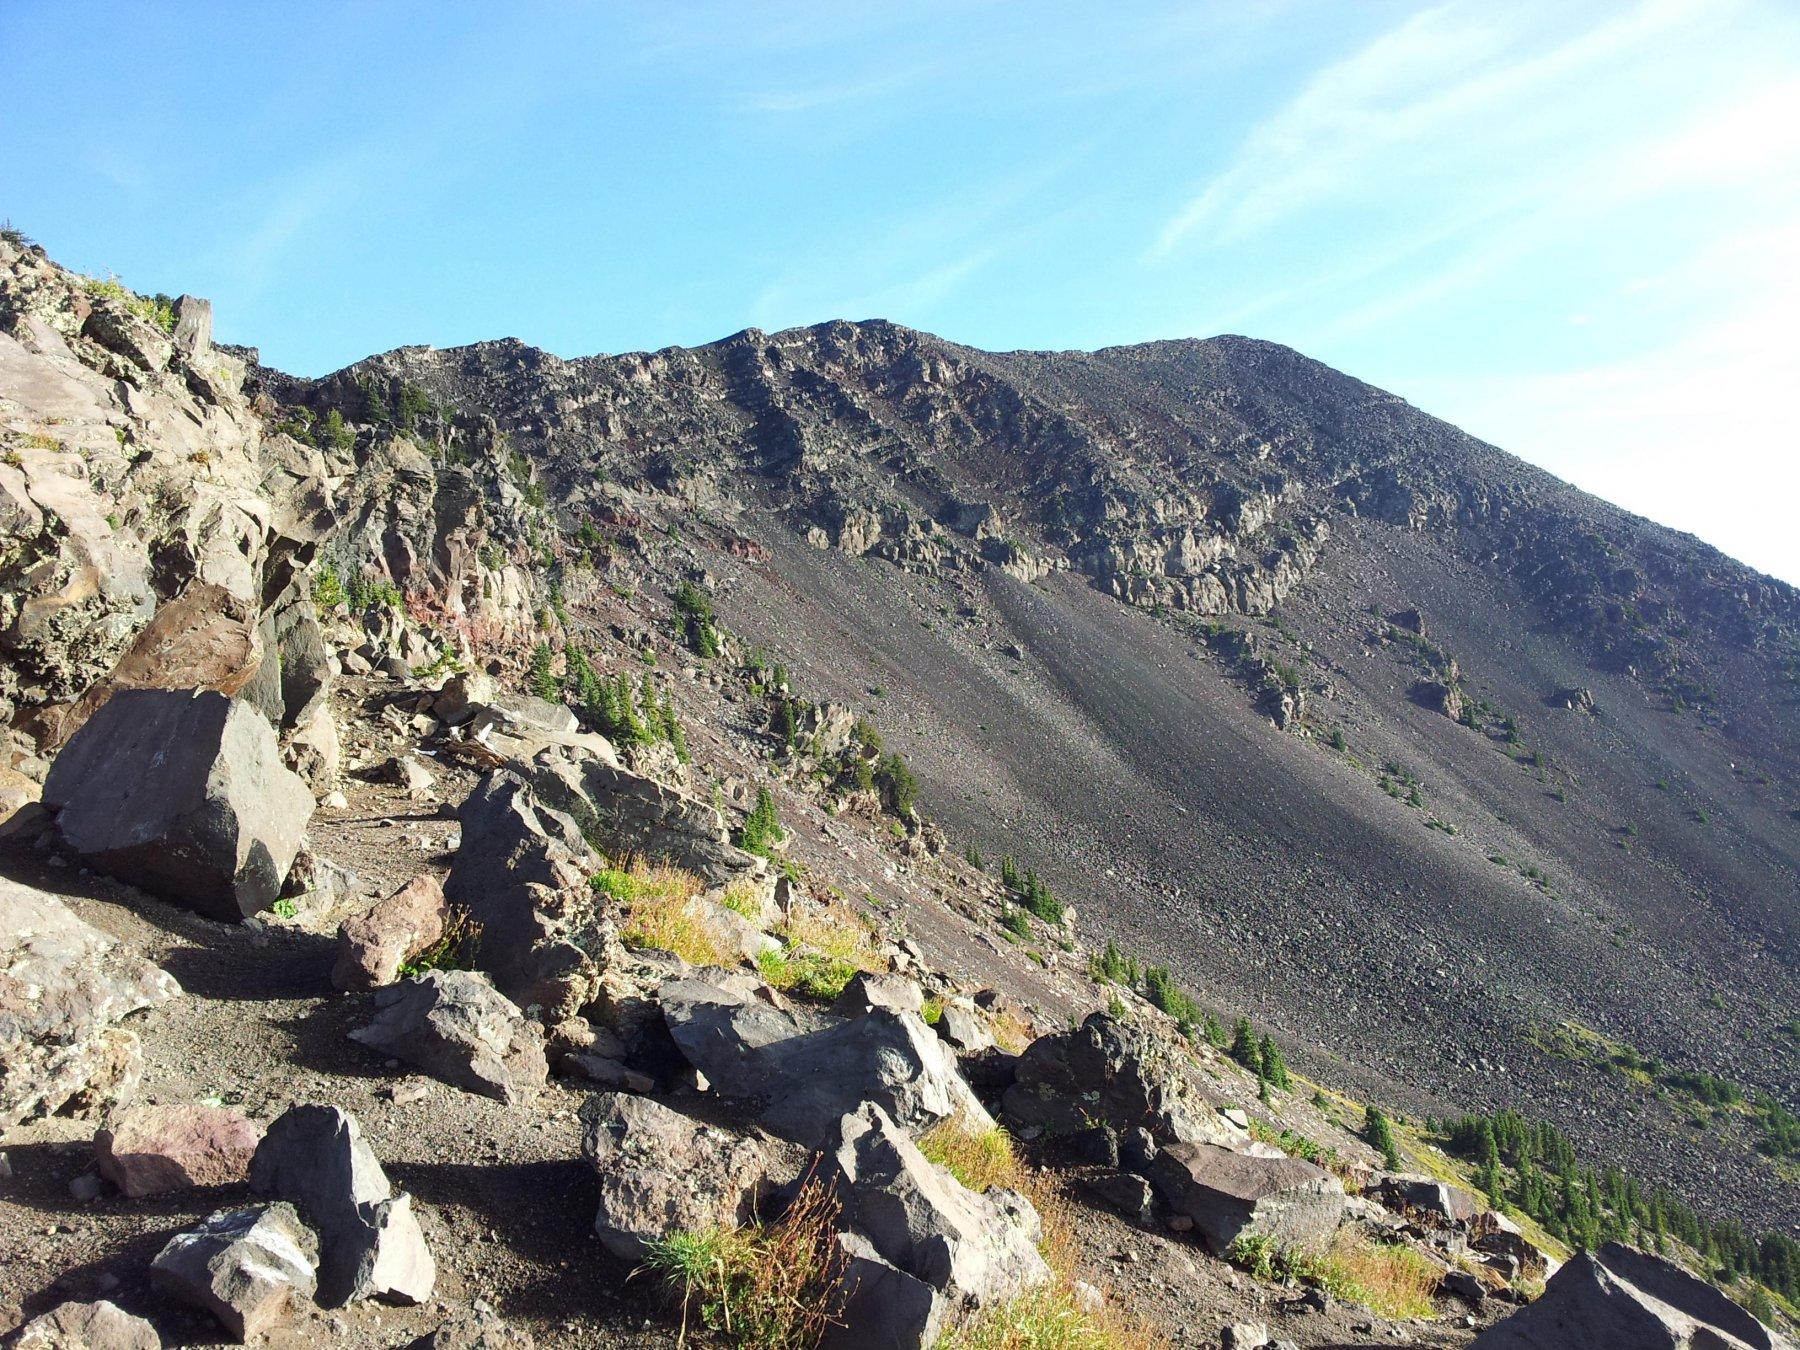 Alla sella guardando verso Nord (Humphreys Peak)